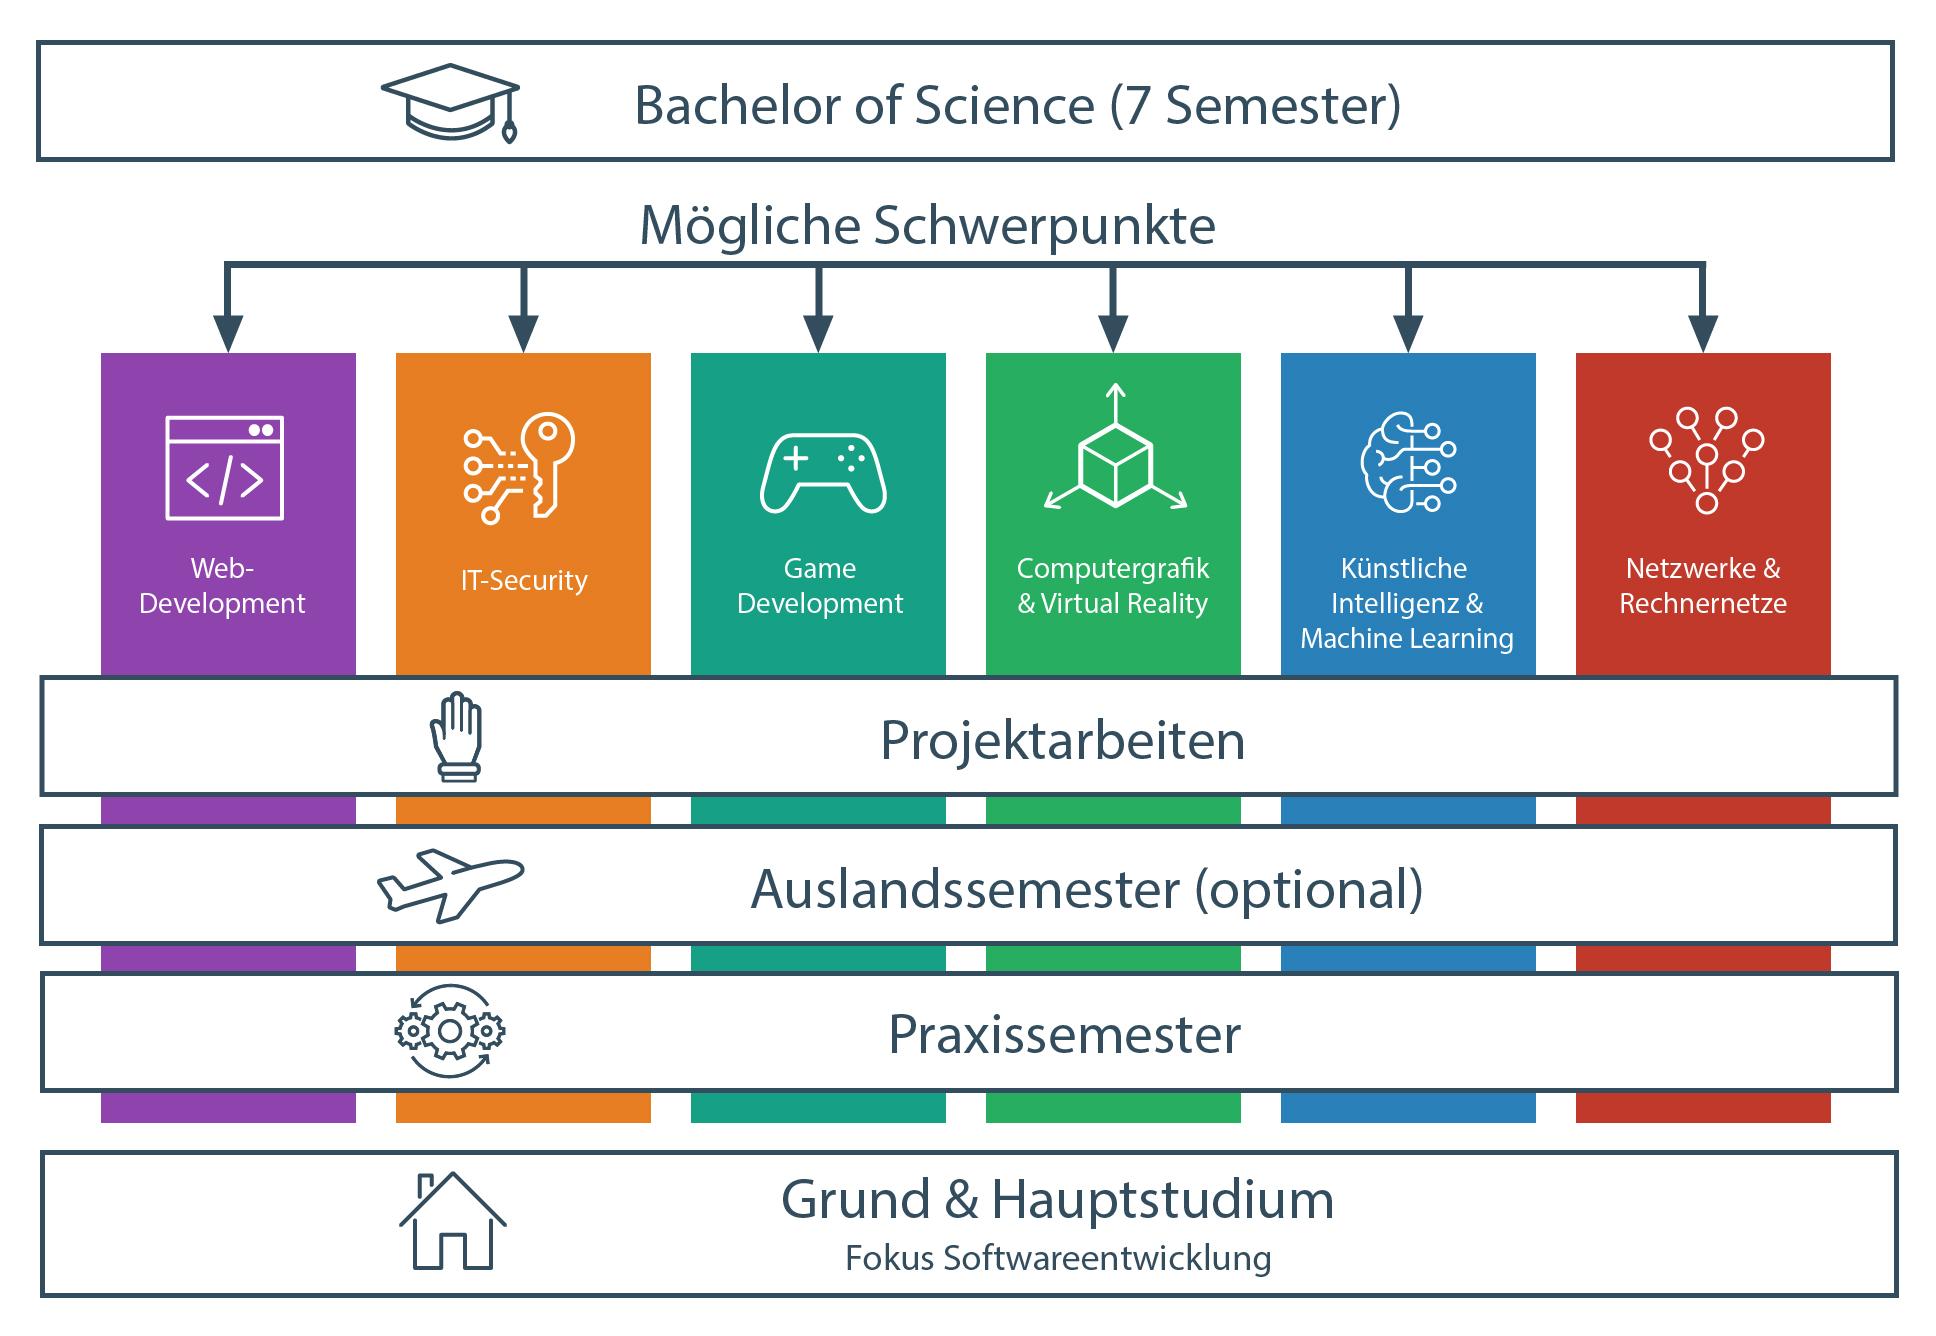 hdm stuttgart bachelor thesis vorlage